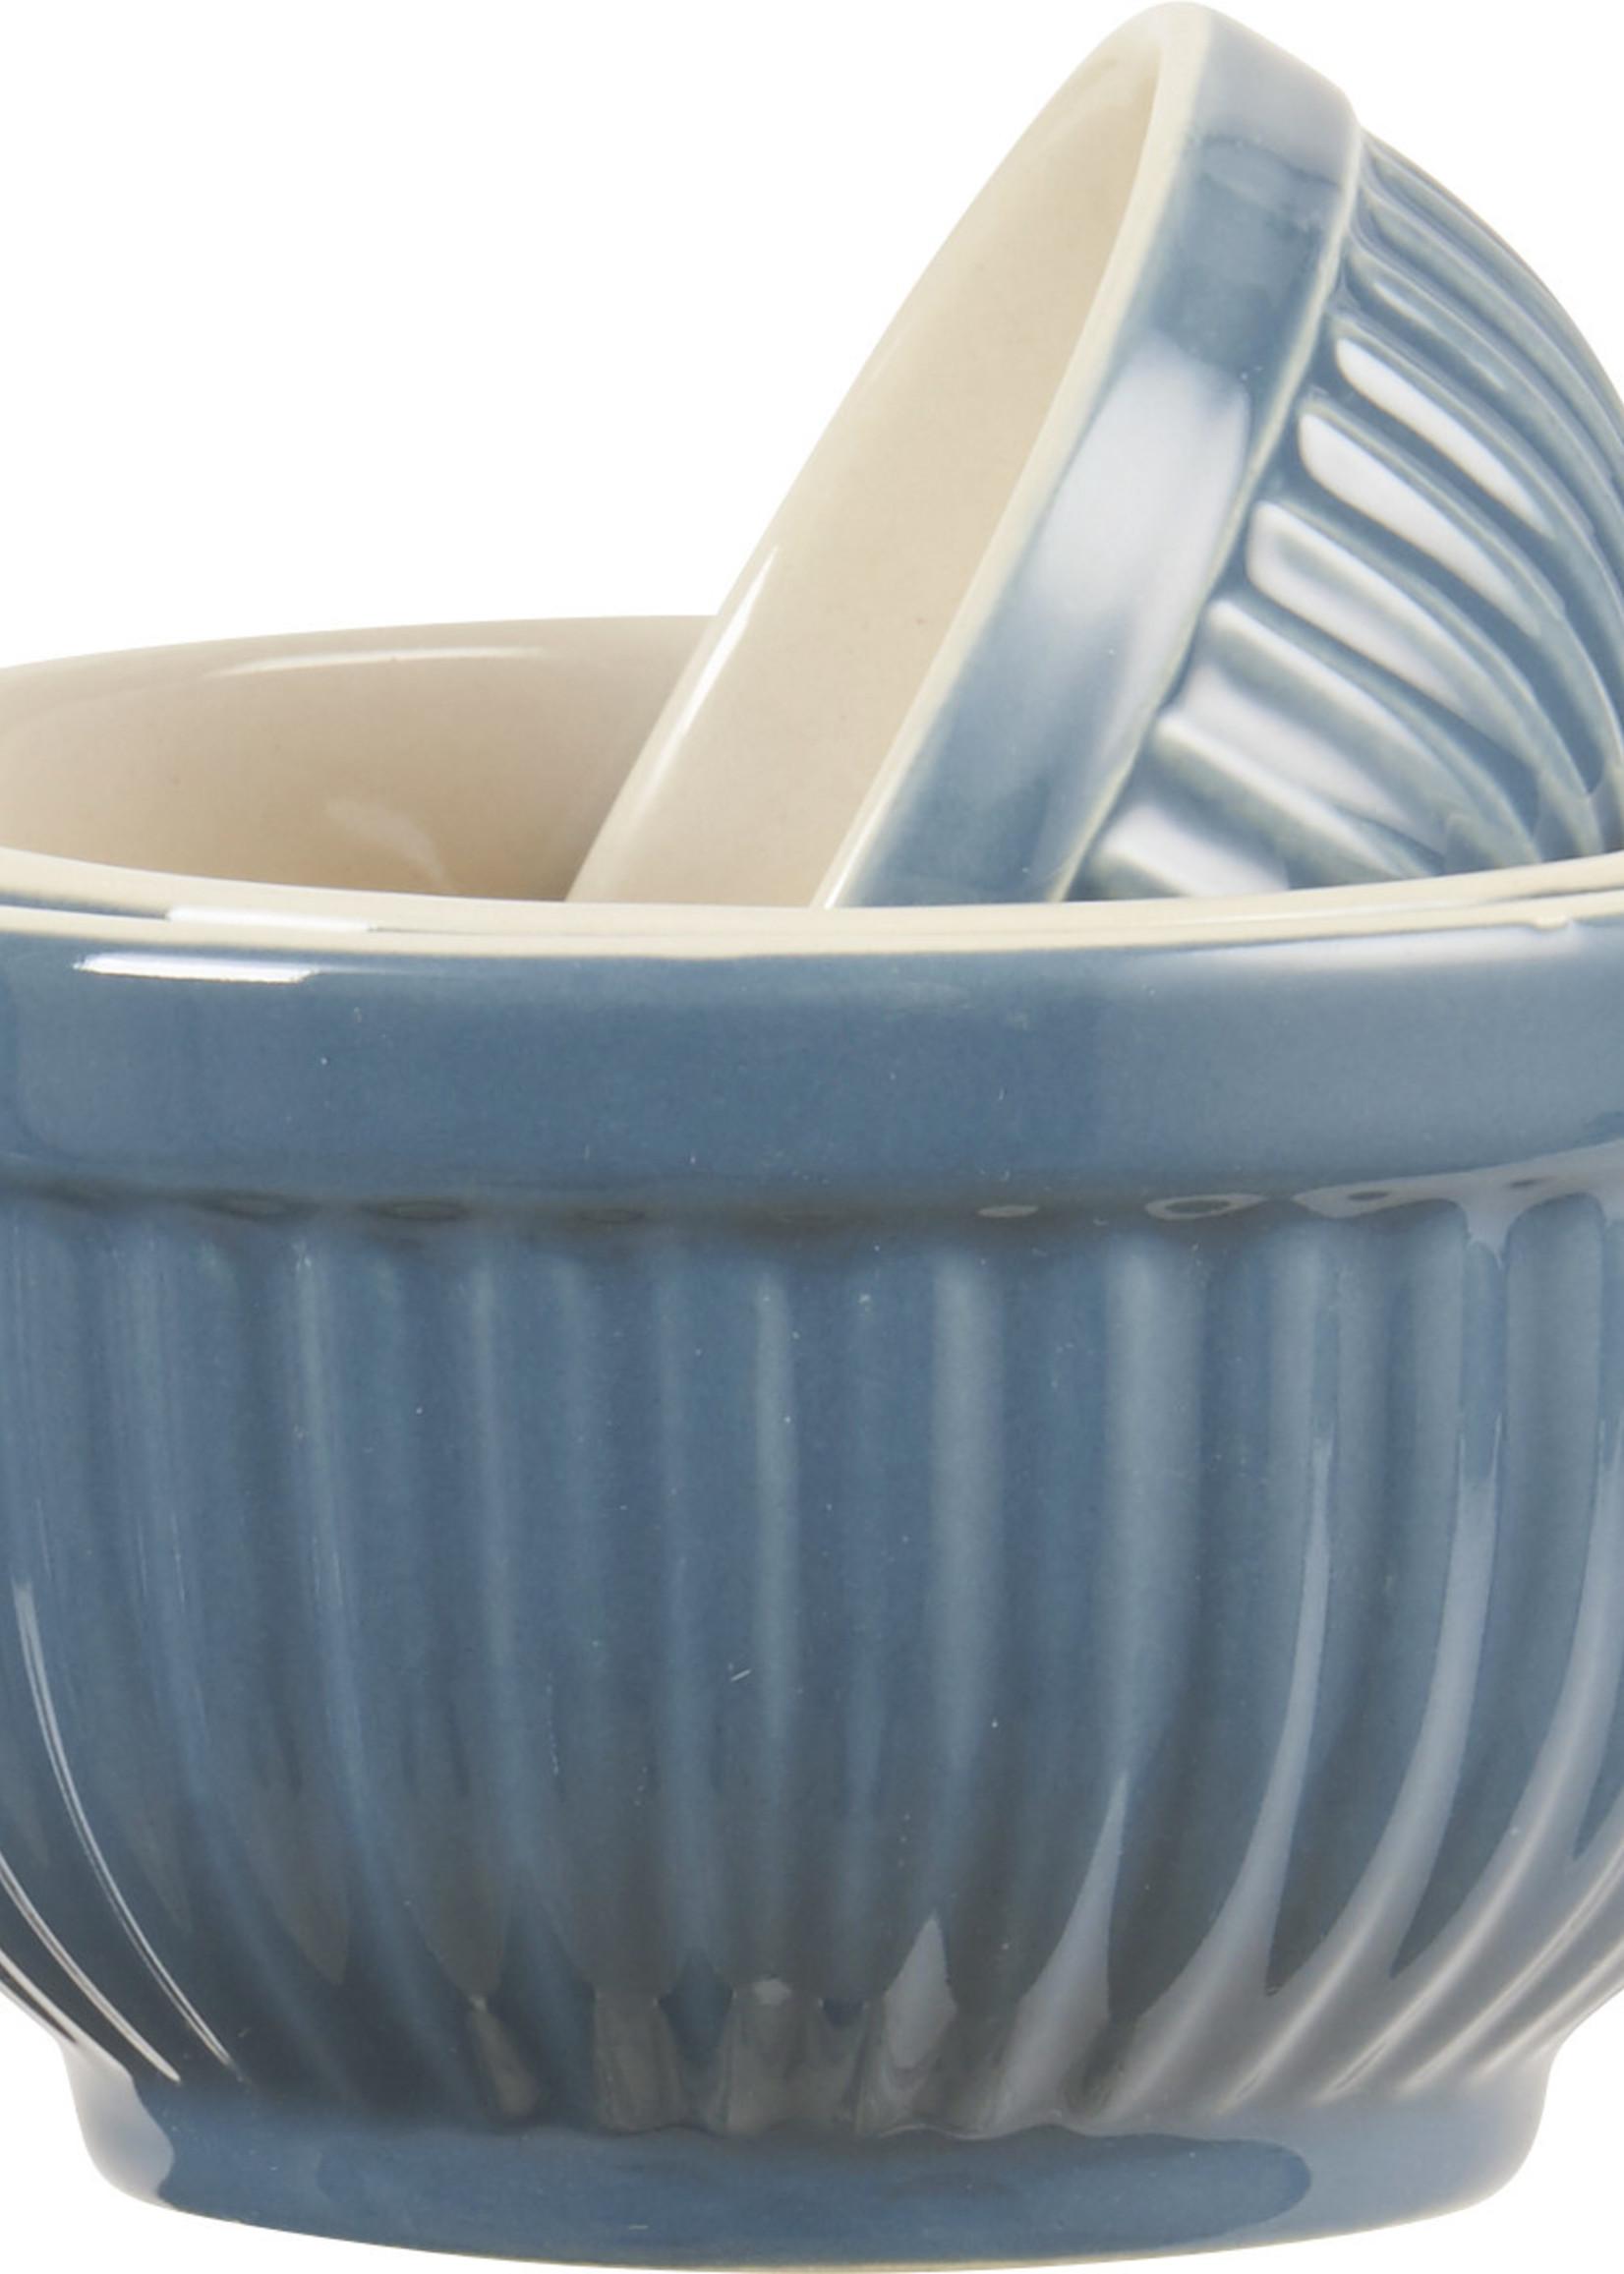 IB LAURSEN IBL Bowl set of 3 mini